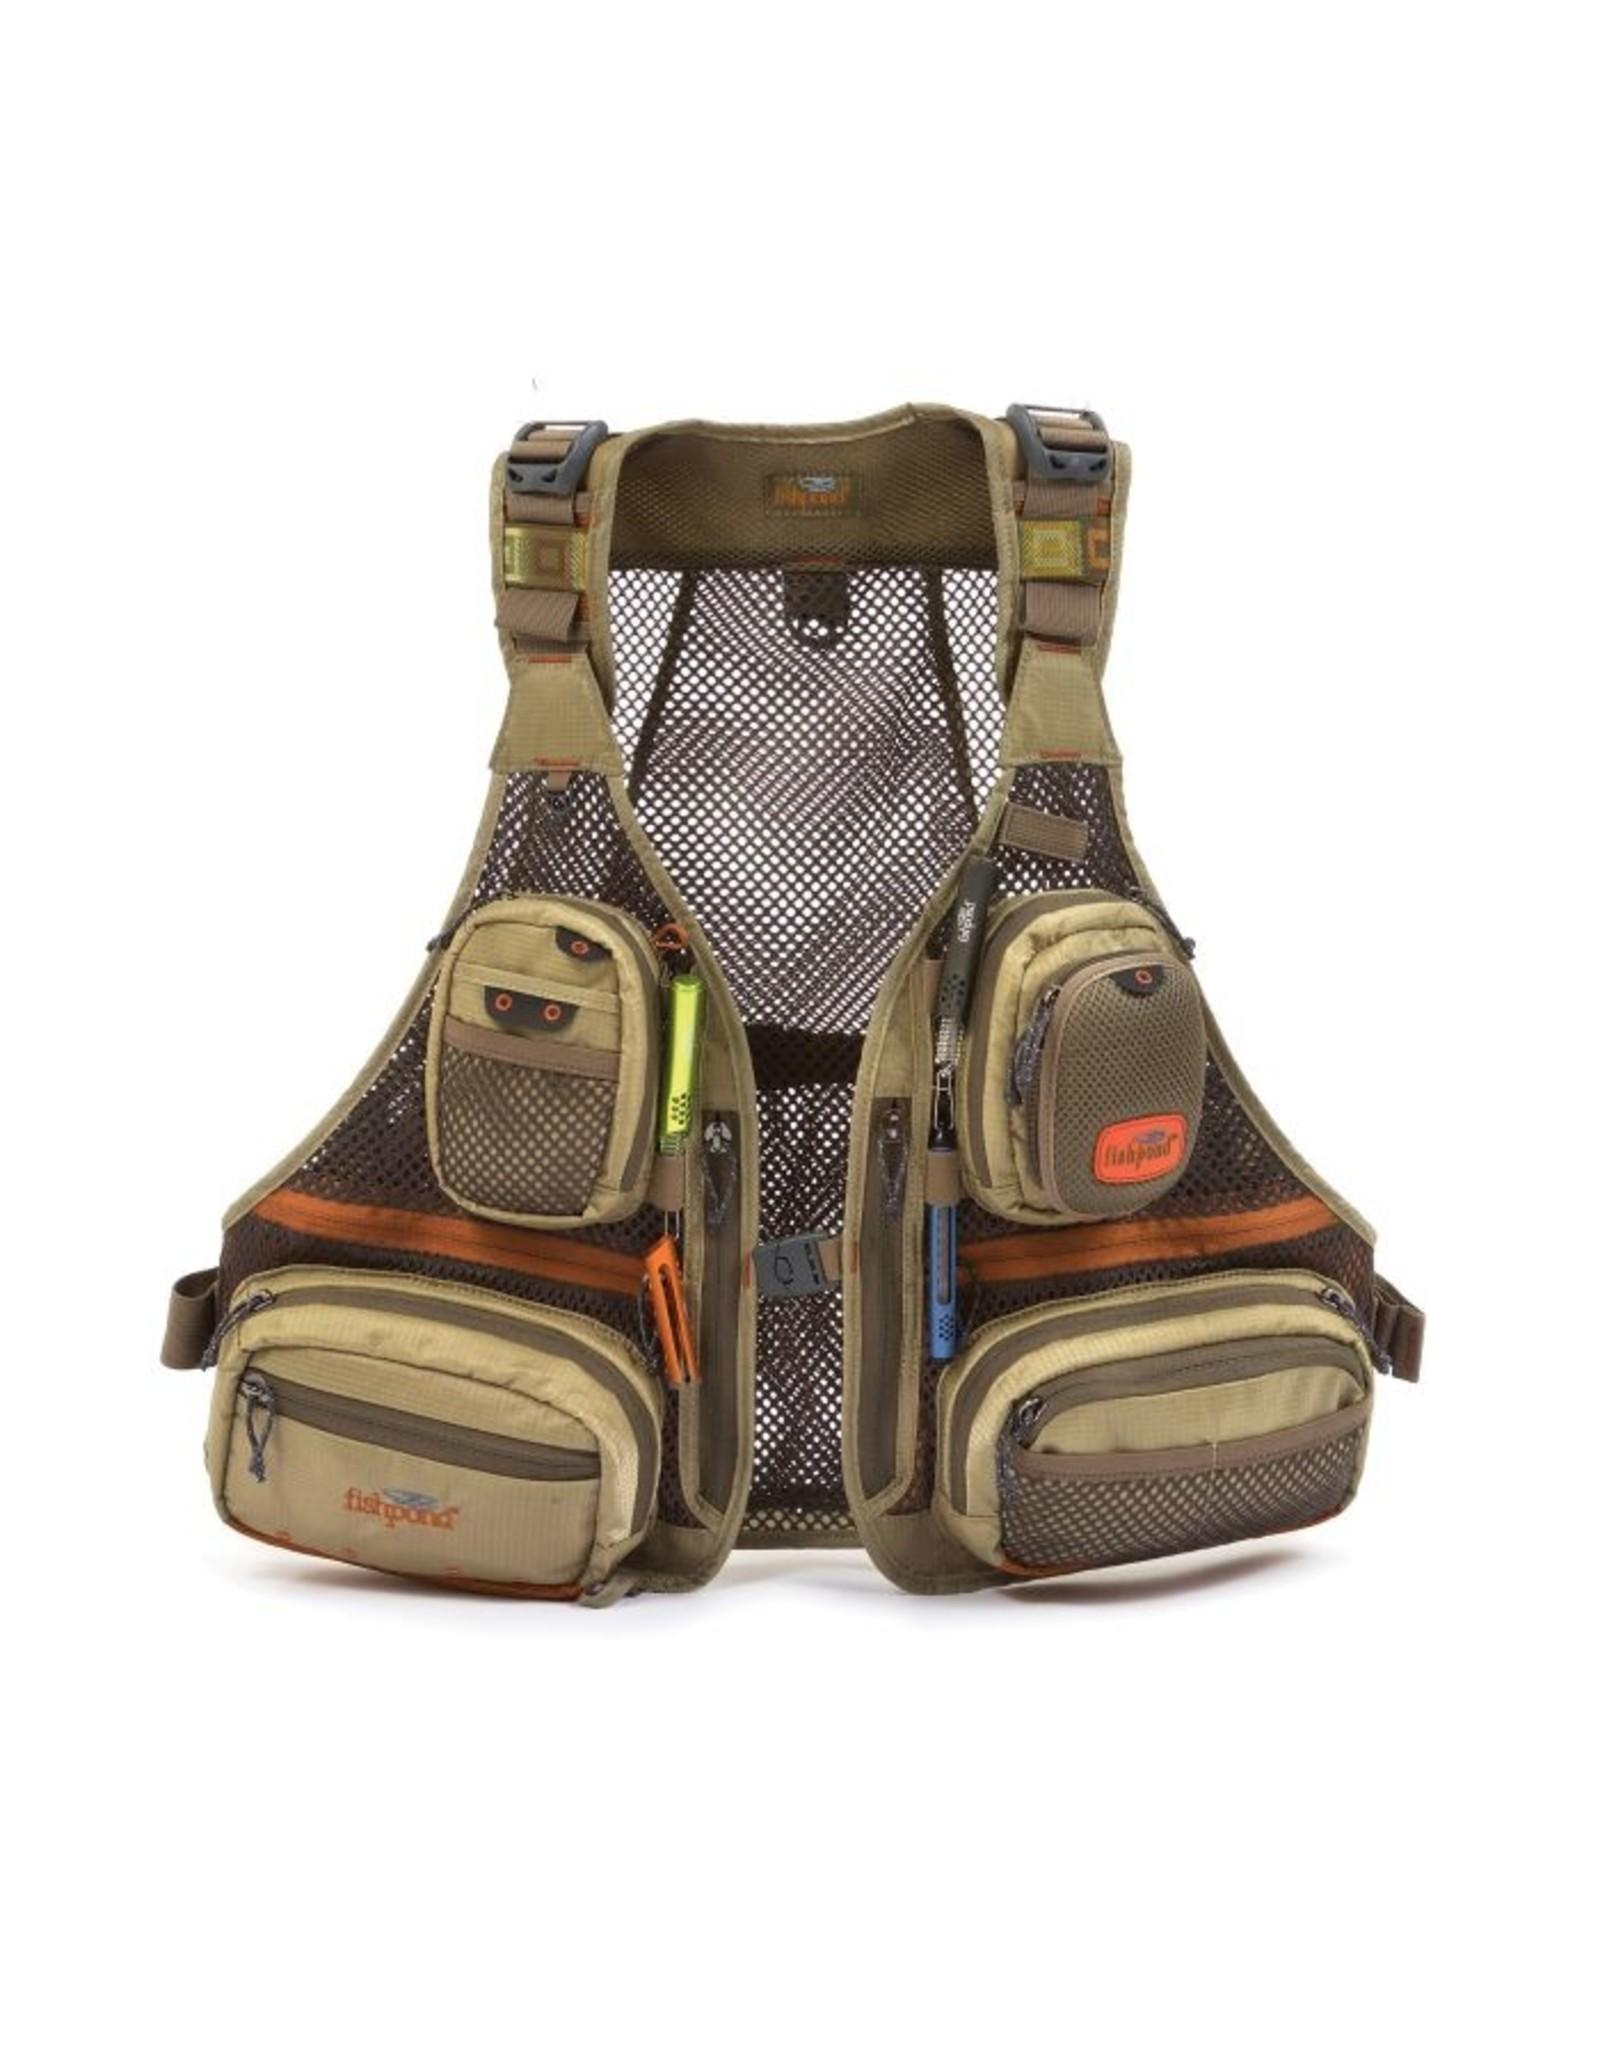 Fishpond Fishpond - Sagebrush Mesh Vest